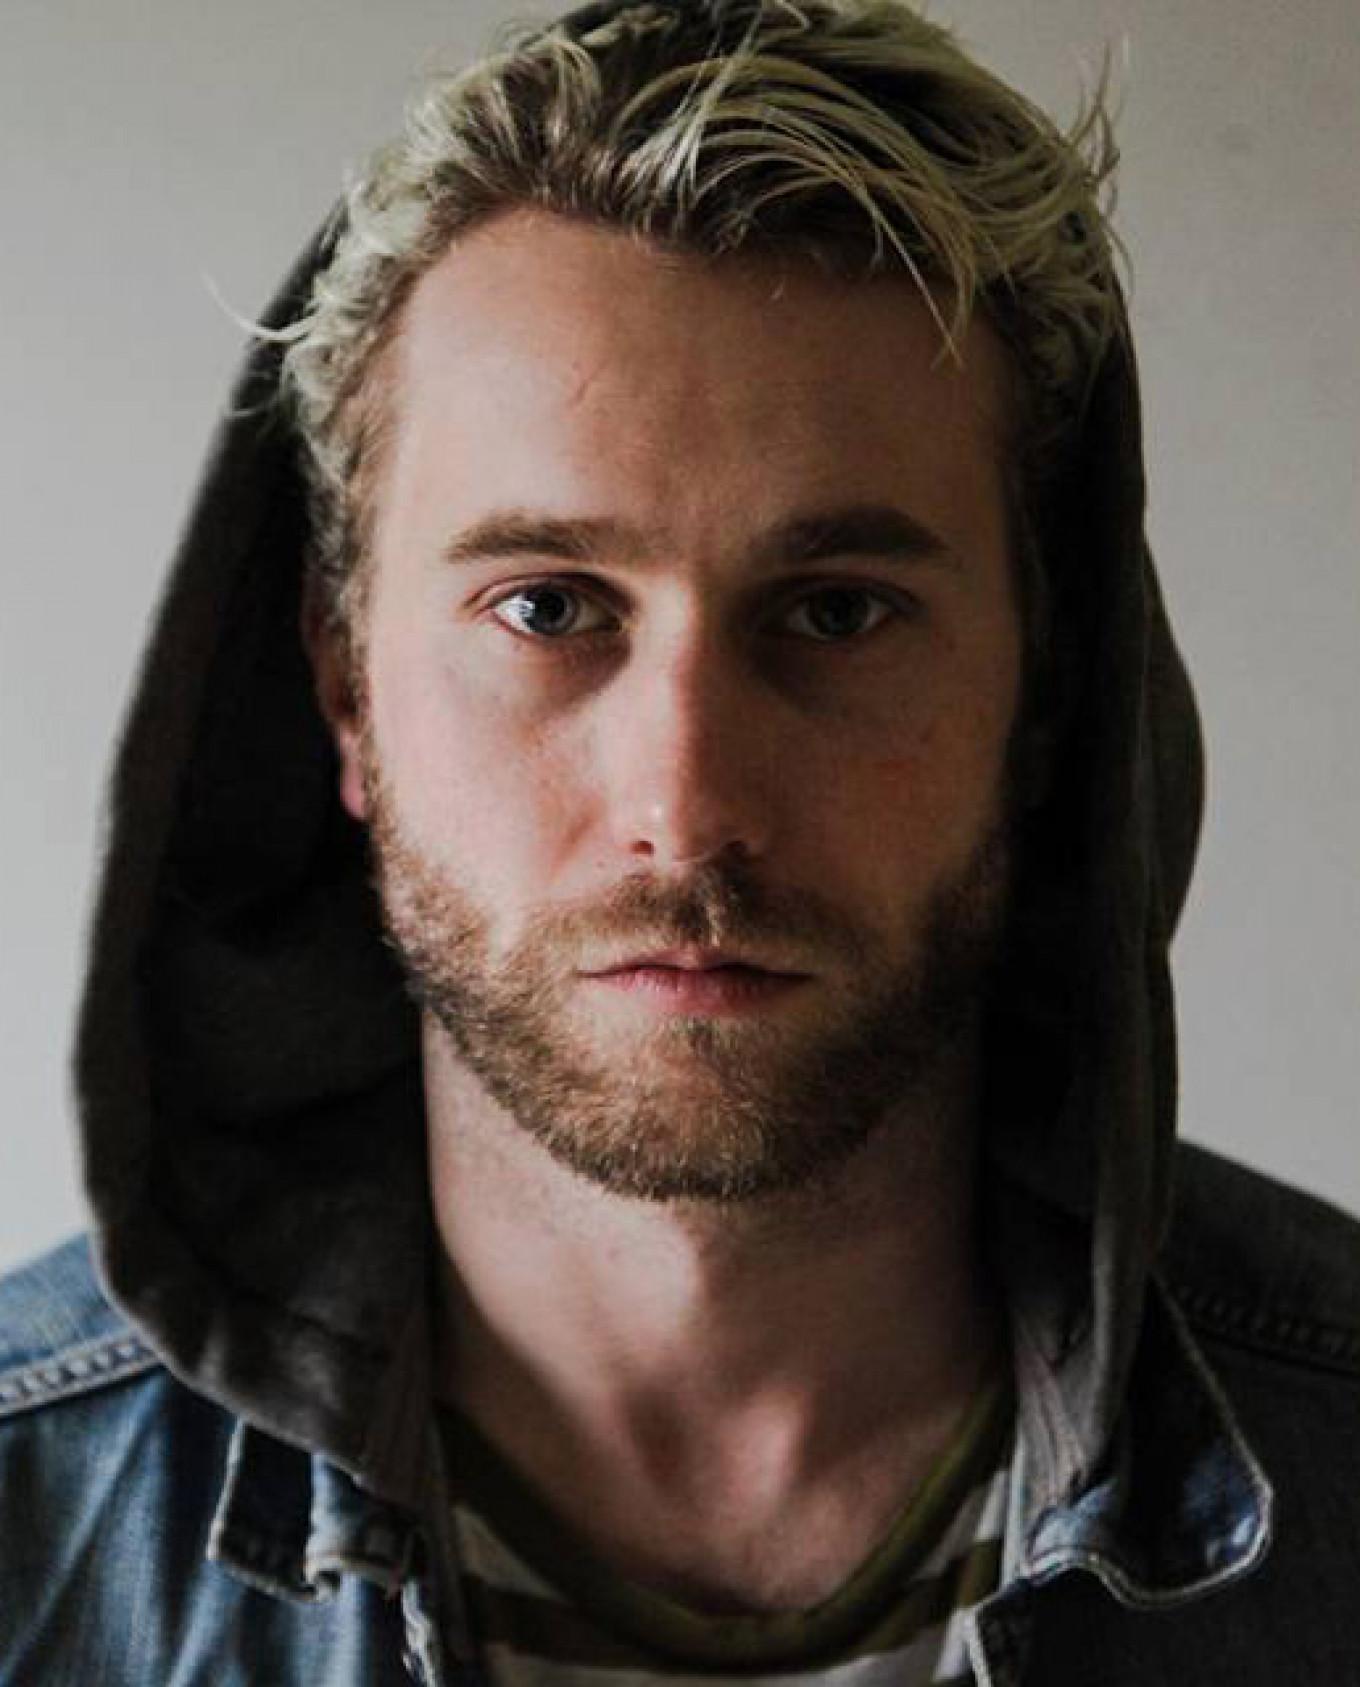 Musician and filmmaker Geraint Rhys Courtesy of Geraint Rhys